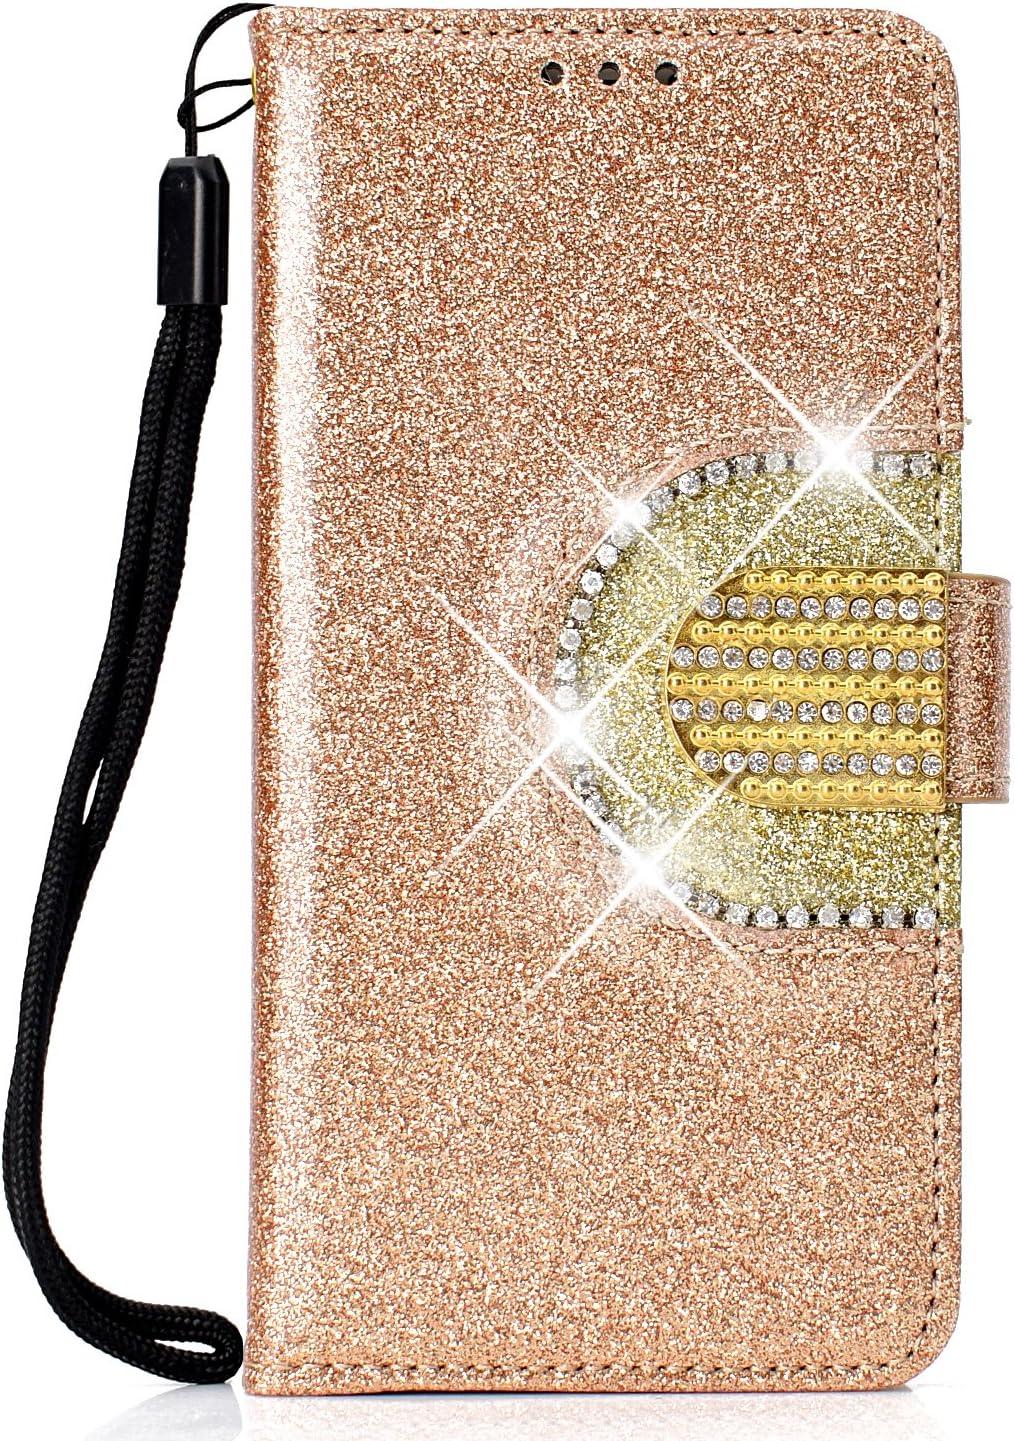 WIWJ Kompatibel mit Huawei Honor 10 Lite//Huawei P Smart 2019 H/ülle Glitzer Diamant Magnet Leder Handyh/ülle 360 Grad Wallet Schutzh/ülle Silikon Flip Klapph/ülle Tasche-Gold